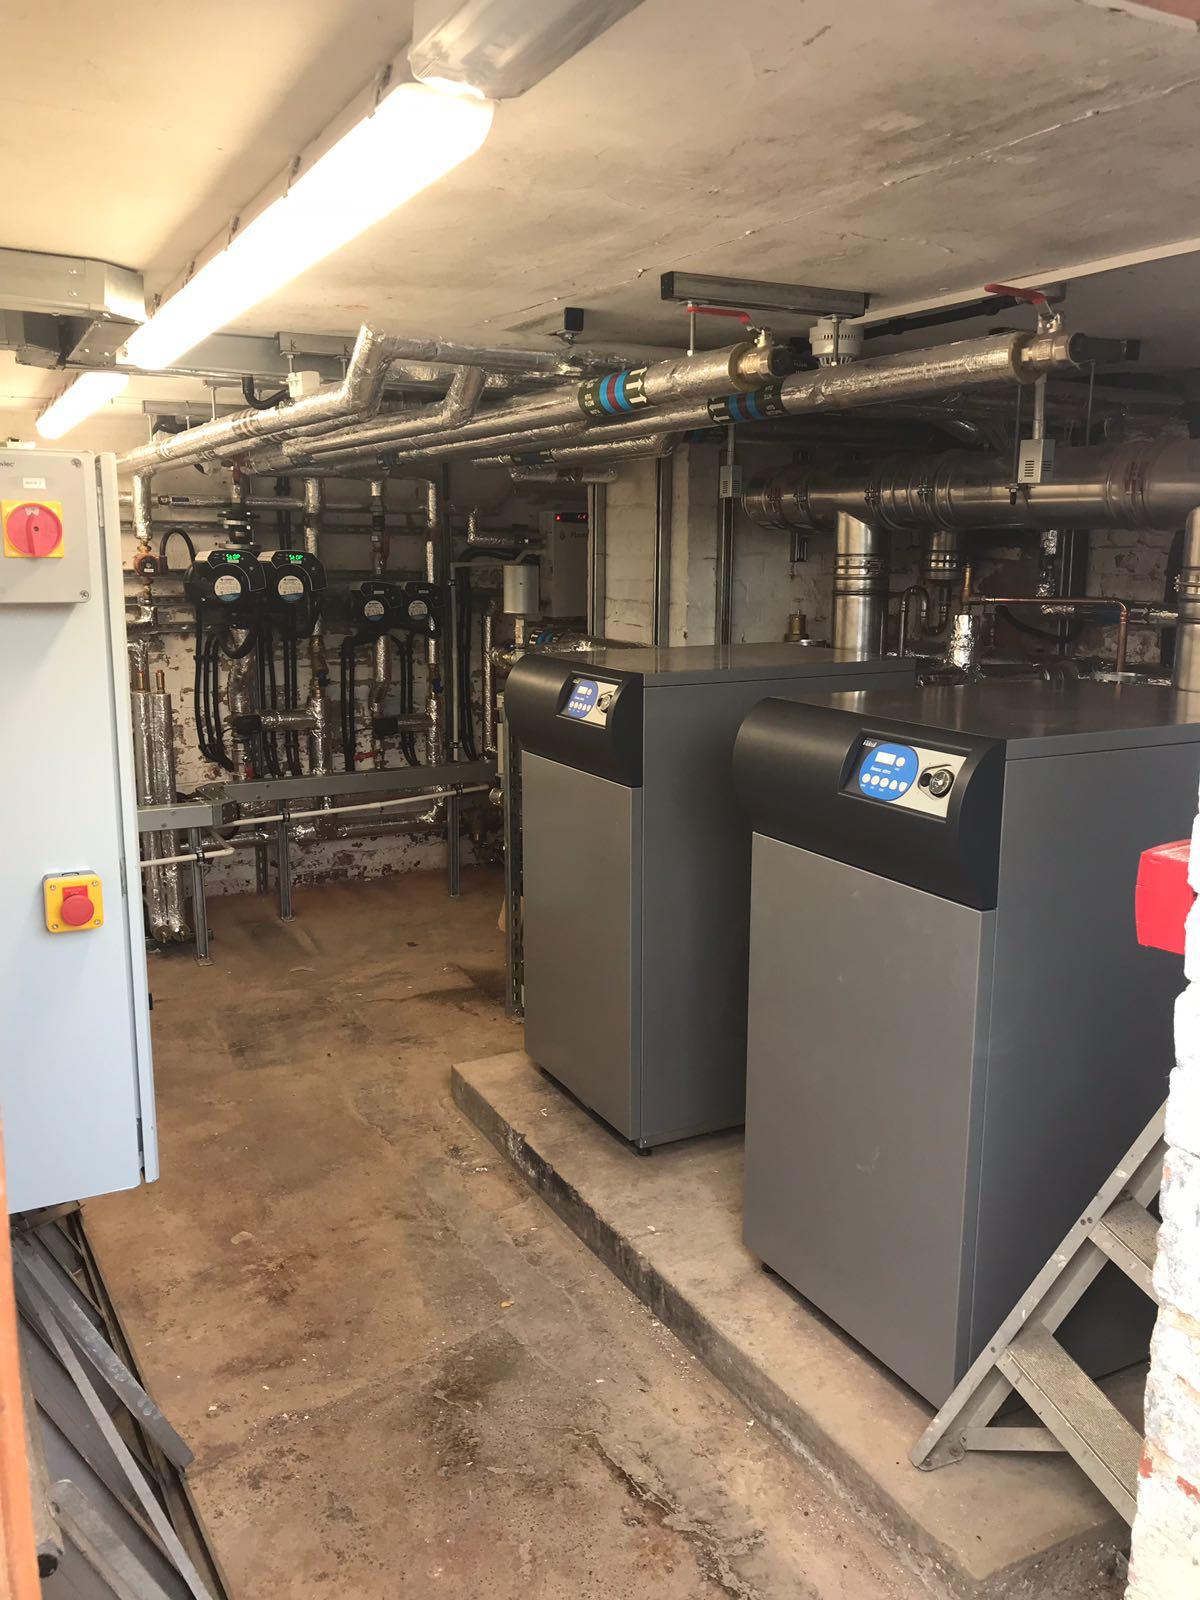 Service 2 HVAC Plant Room - Badby School